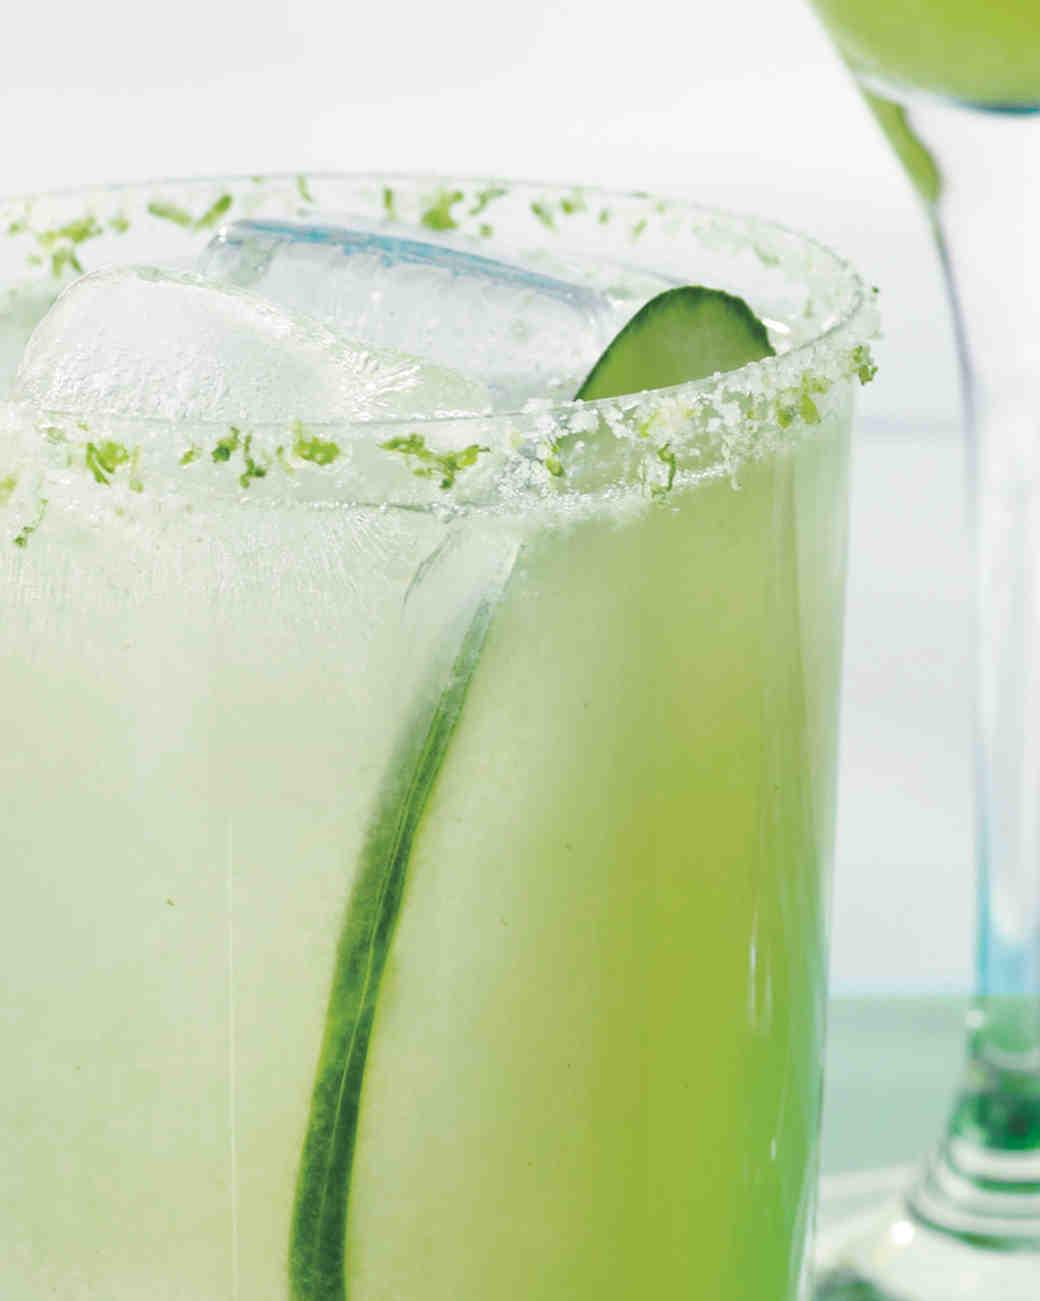 wedding-mocktail-recipes-agua-verde-109950-cocktails-su13-0915.jpg